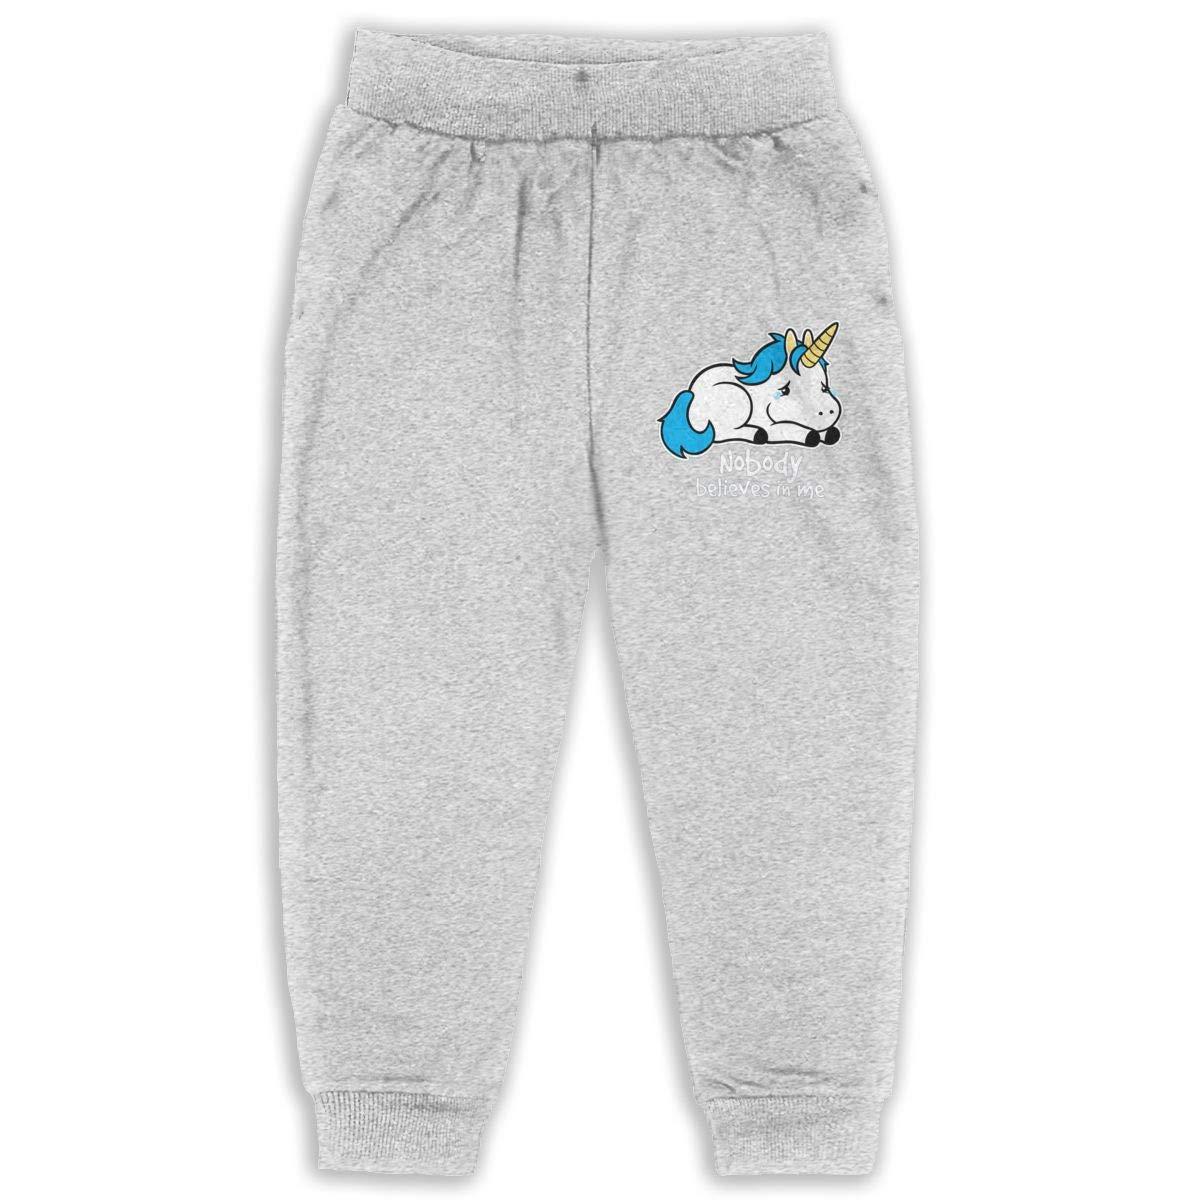 Sad Unicorn Kids Cotton Sweatpants,Jogger Long Jersey Sweatpants